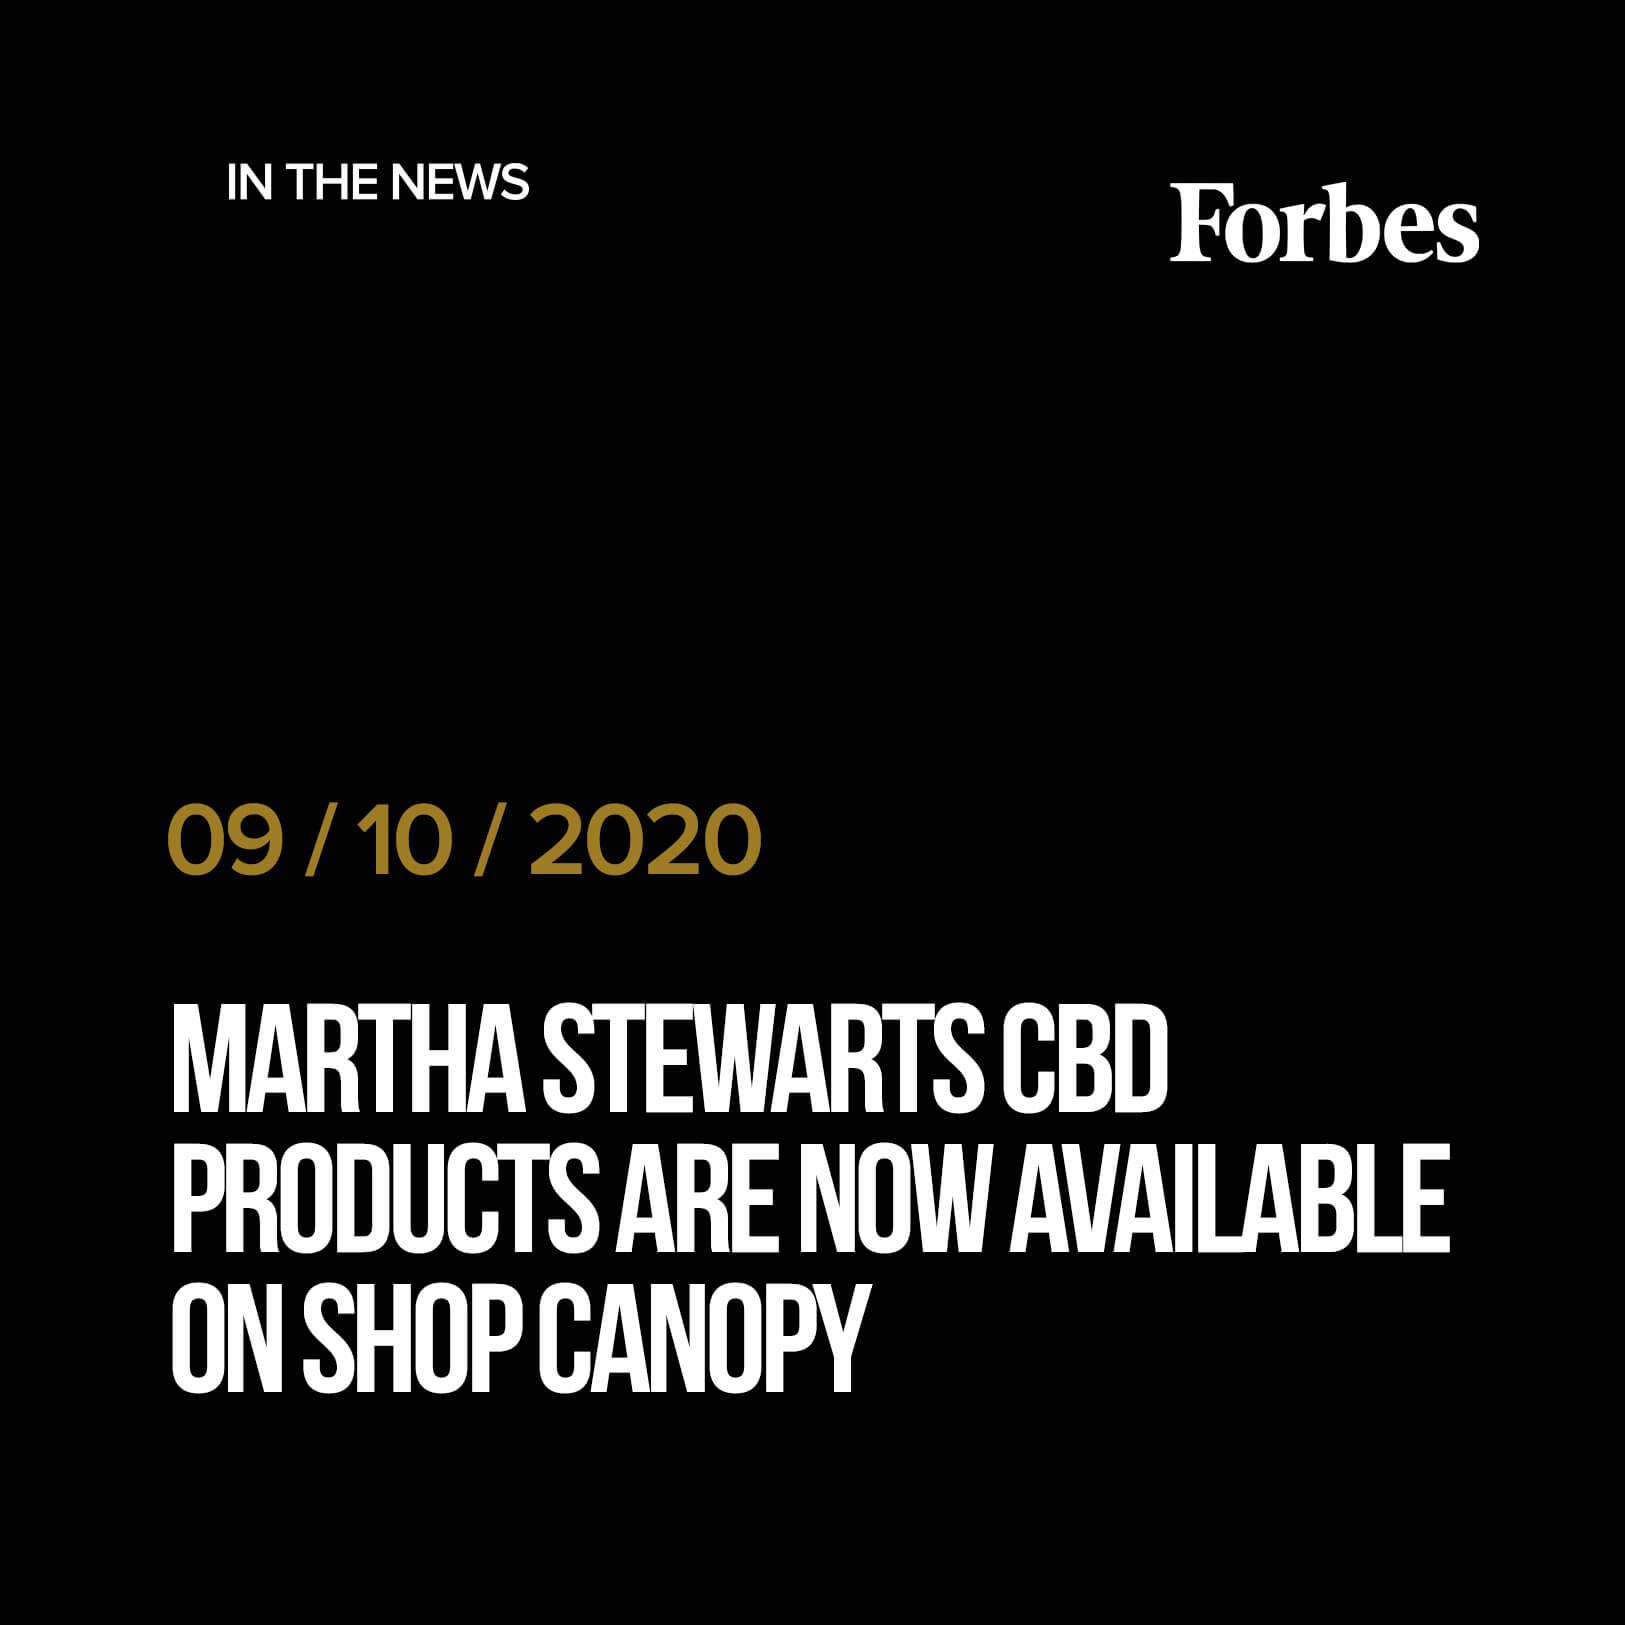 Martha Stewart cbd products now available on shopcanopy.com